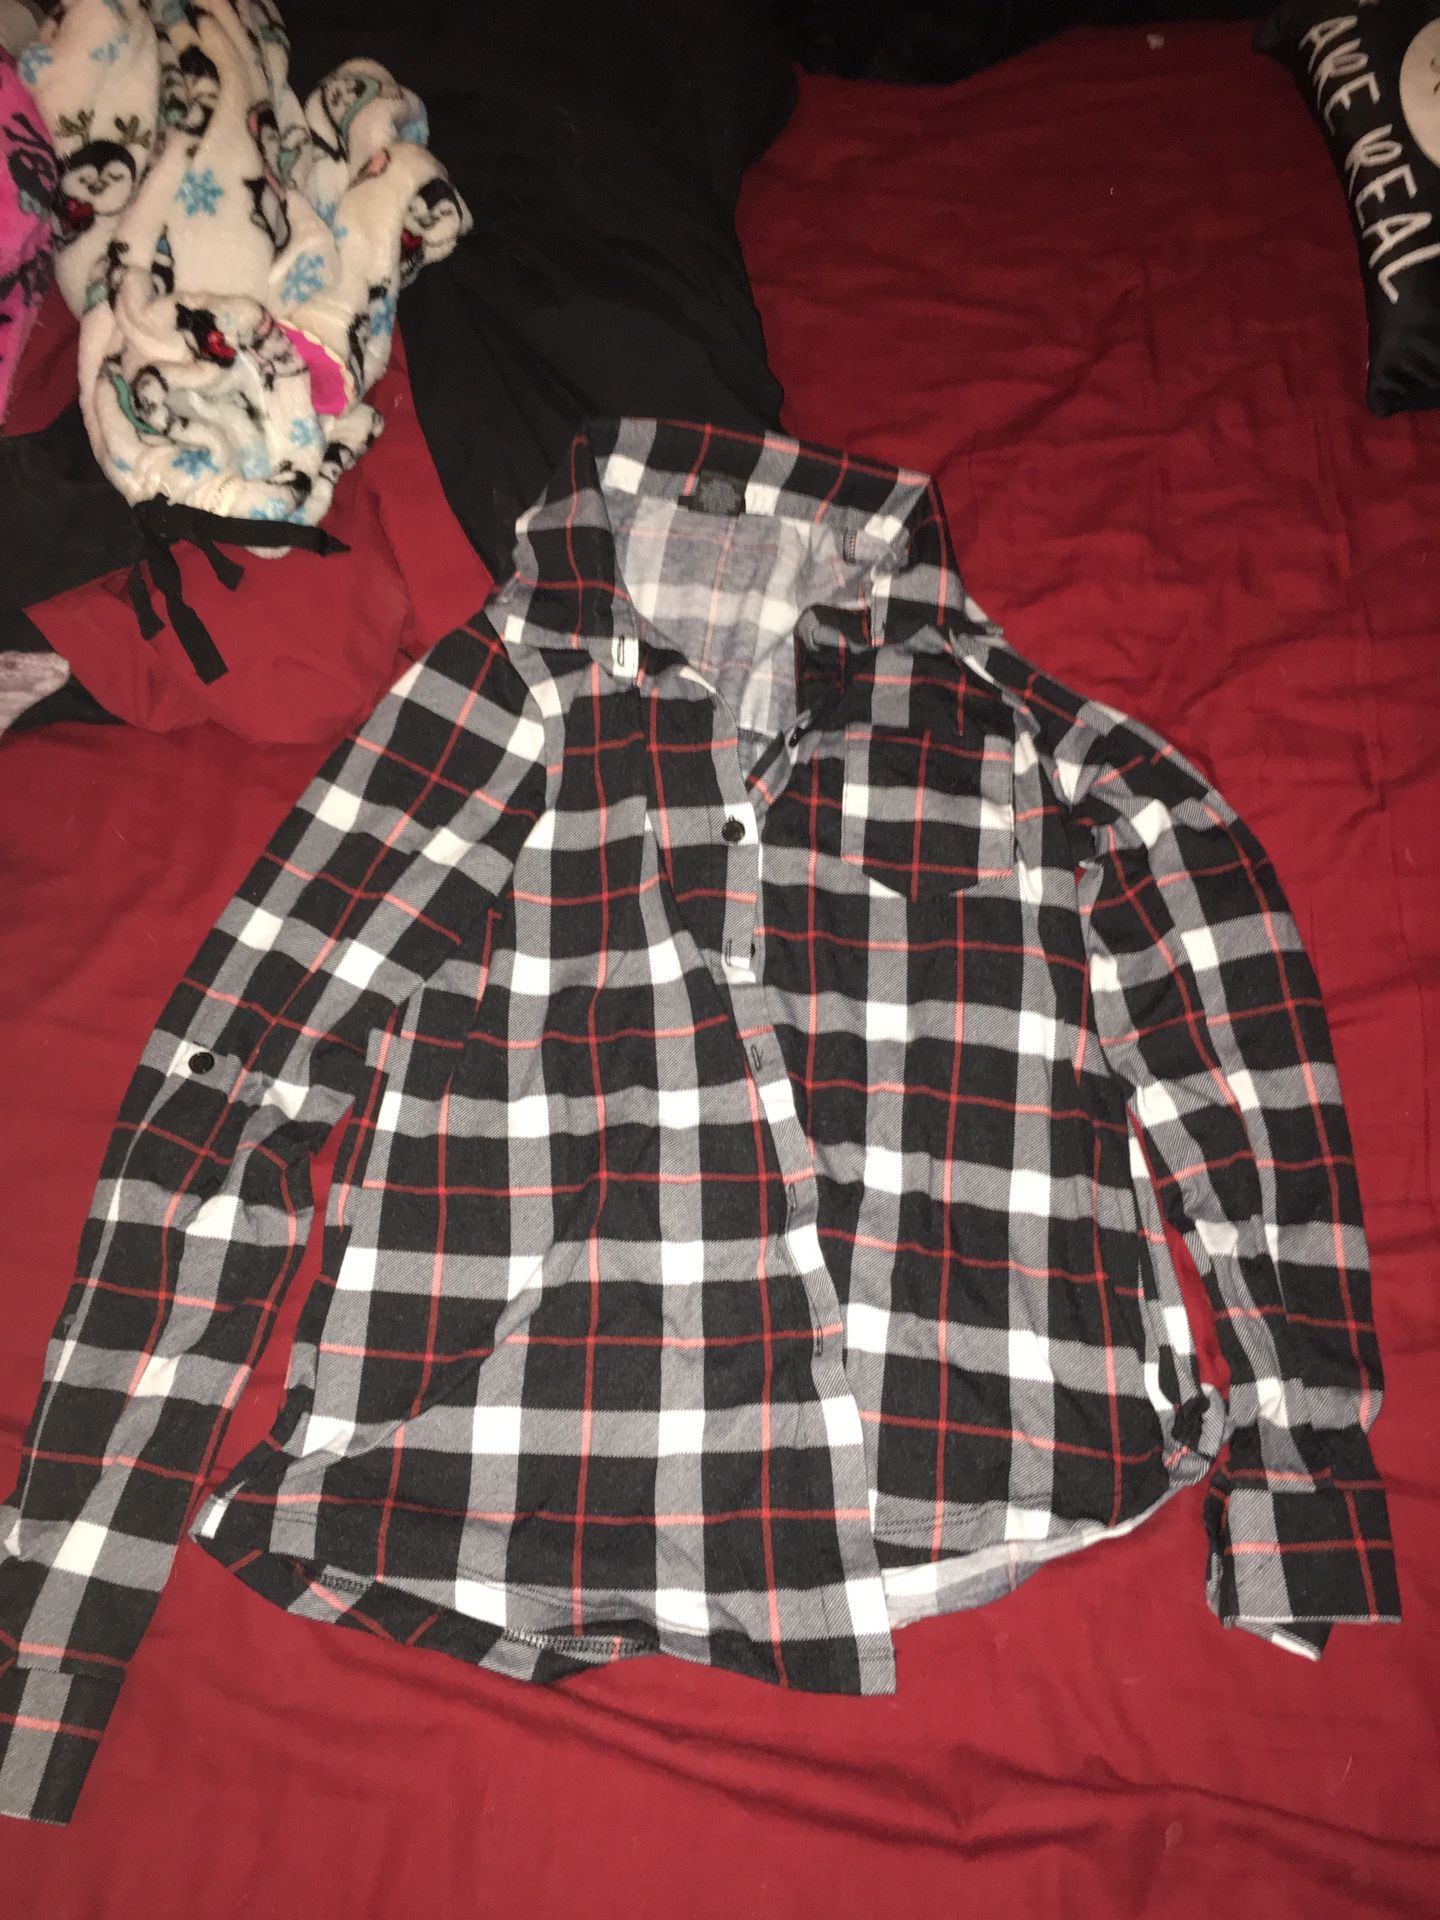 Women's size medium plaid shirt